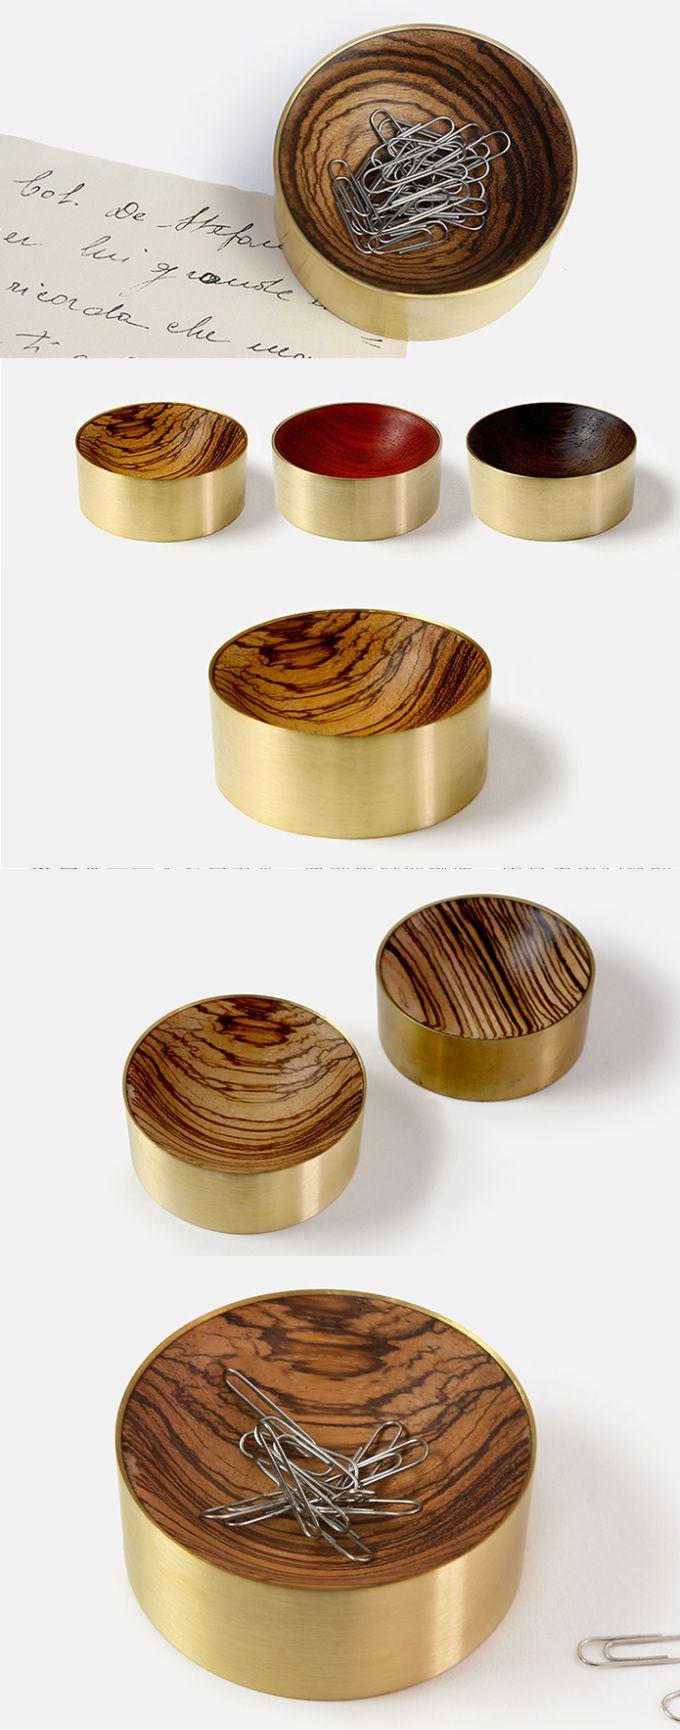 Wood Wooden Brass Magnetic Paper Clip Holder Magnetic Clip Collector Desktop Items Collectables The Clipper Paper Clips Holder Magnetic Paper Paper Clip [ 1730 x 680 Pixel ]